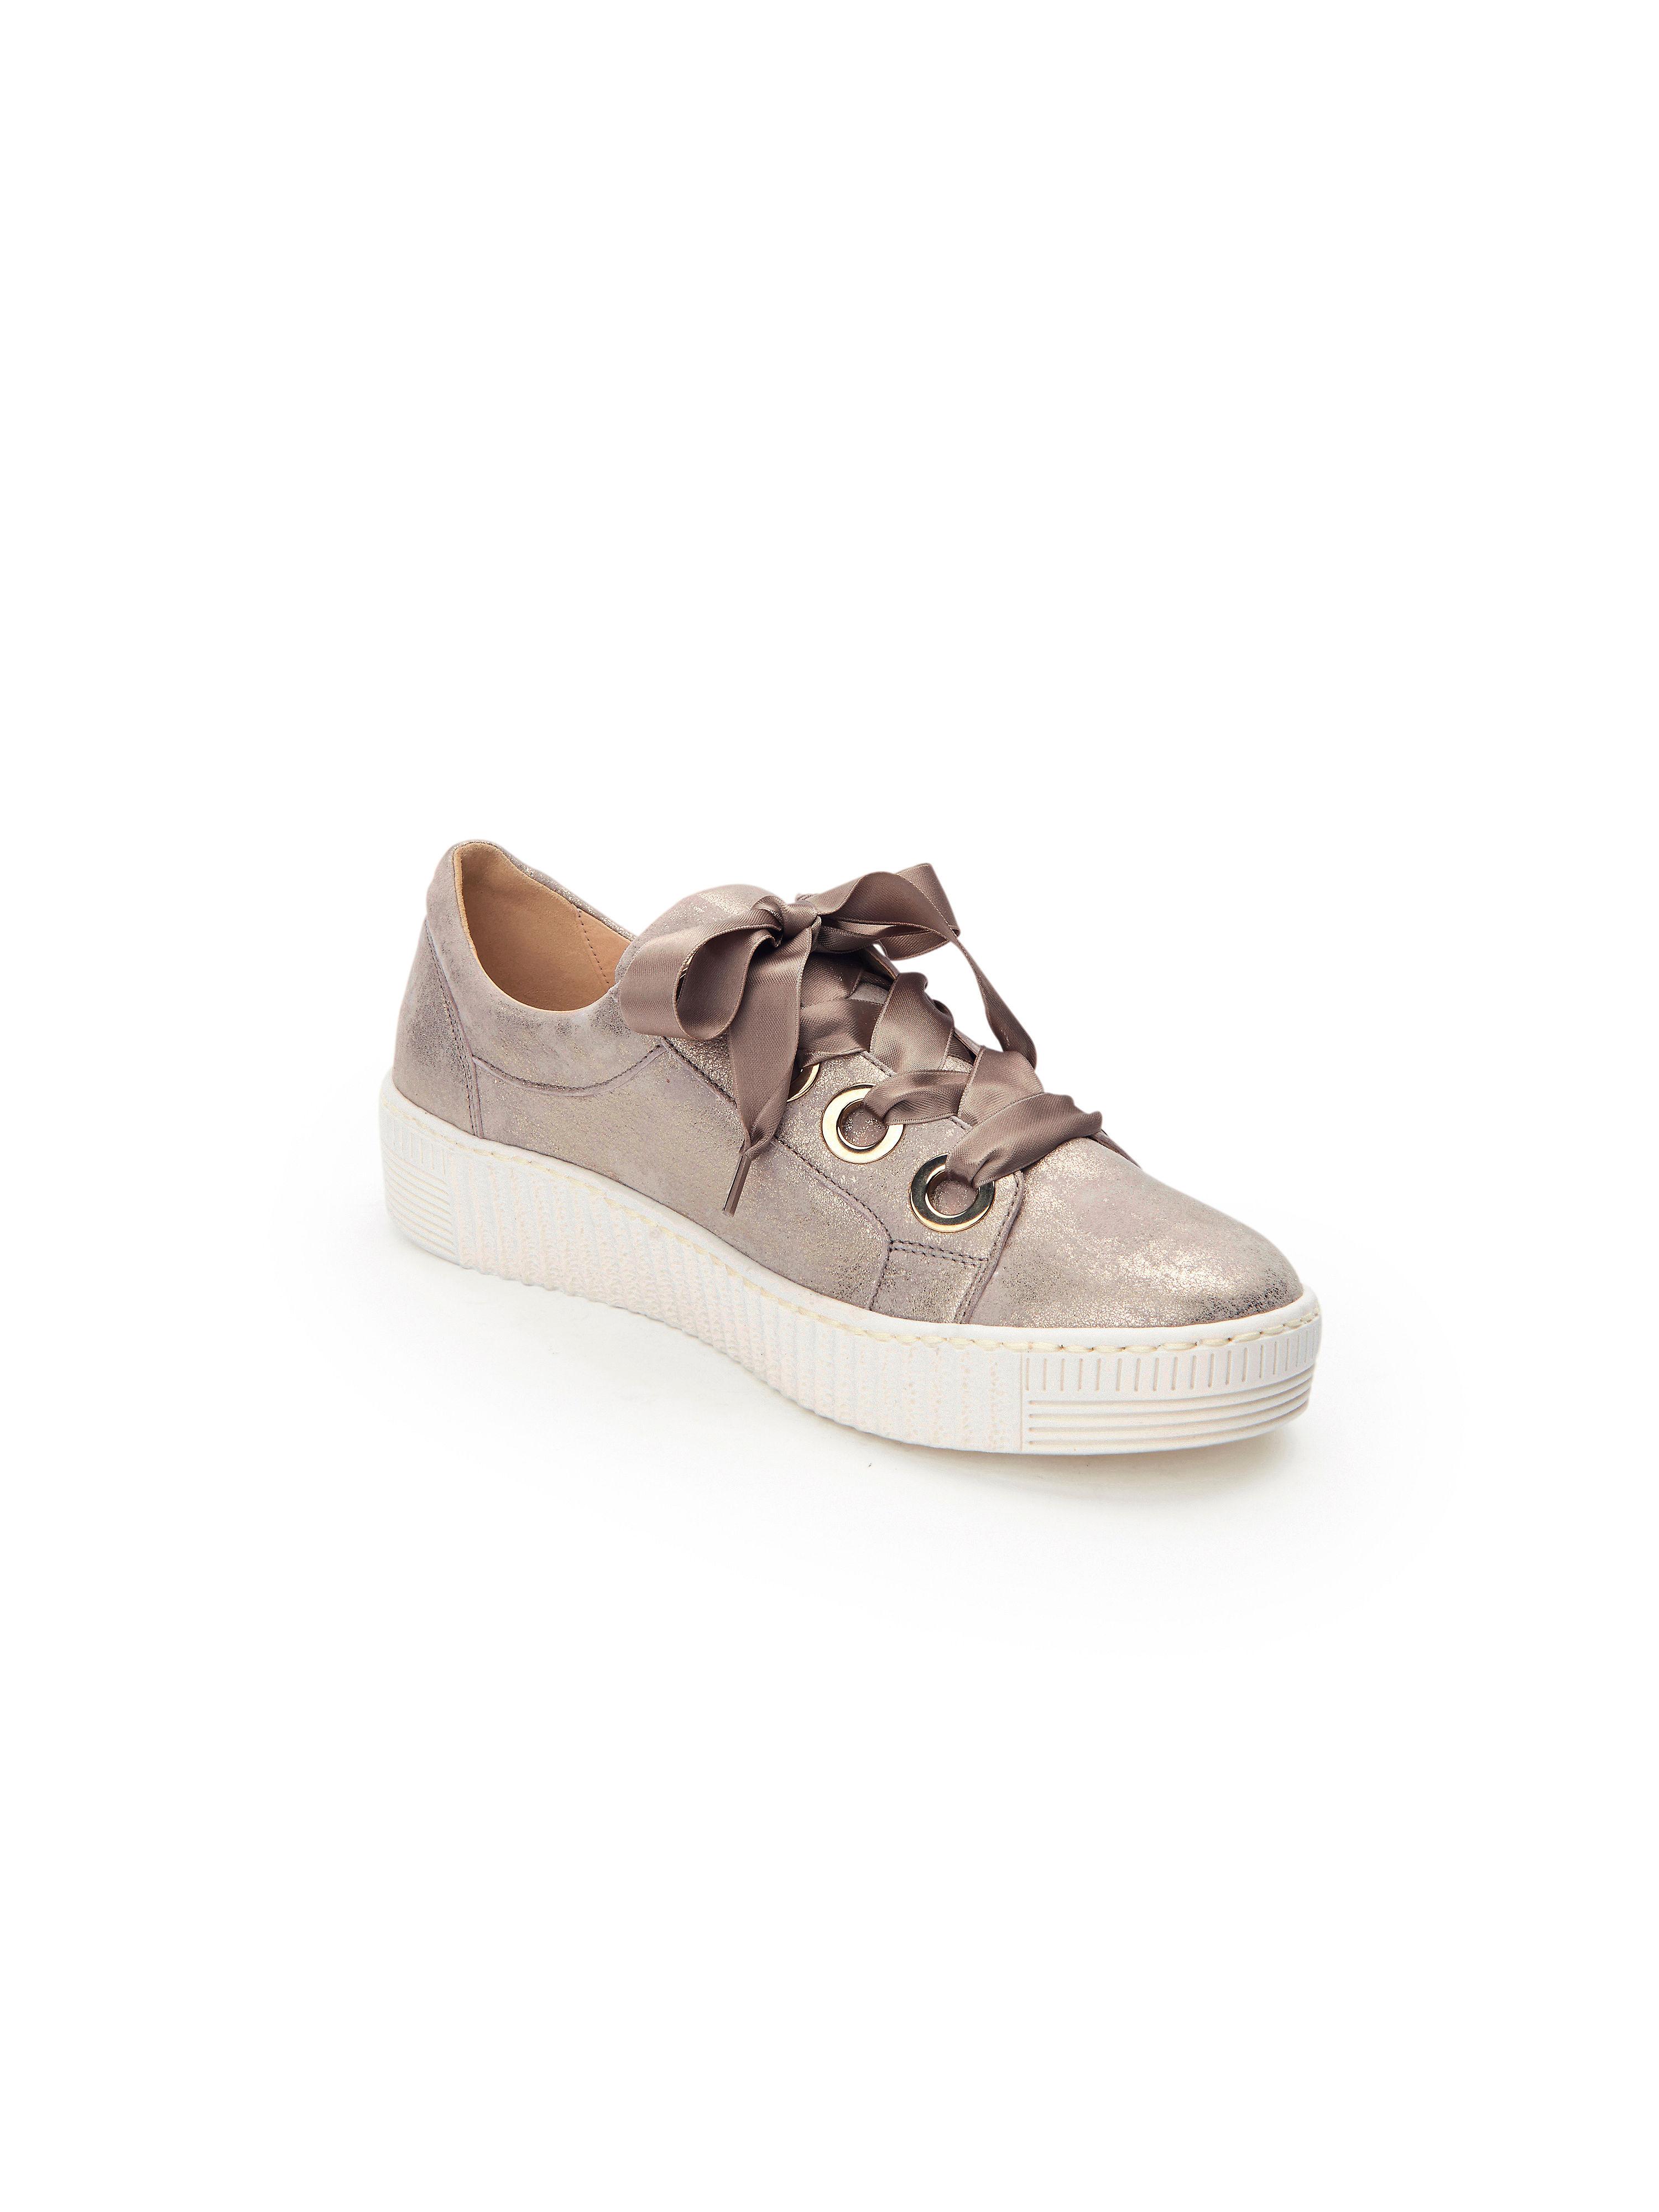 Gabor - Sneaker - Helltaupe-Metallic Gute Qualität beliebte Schuhe